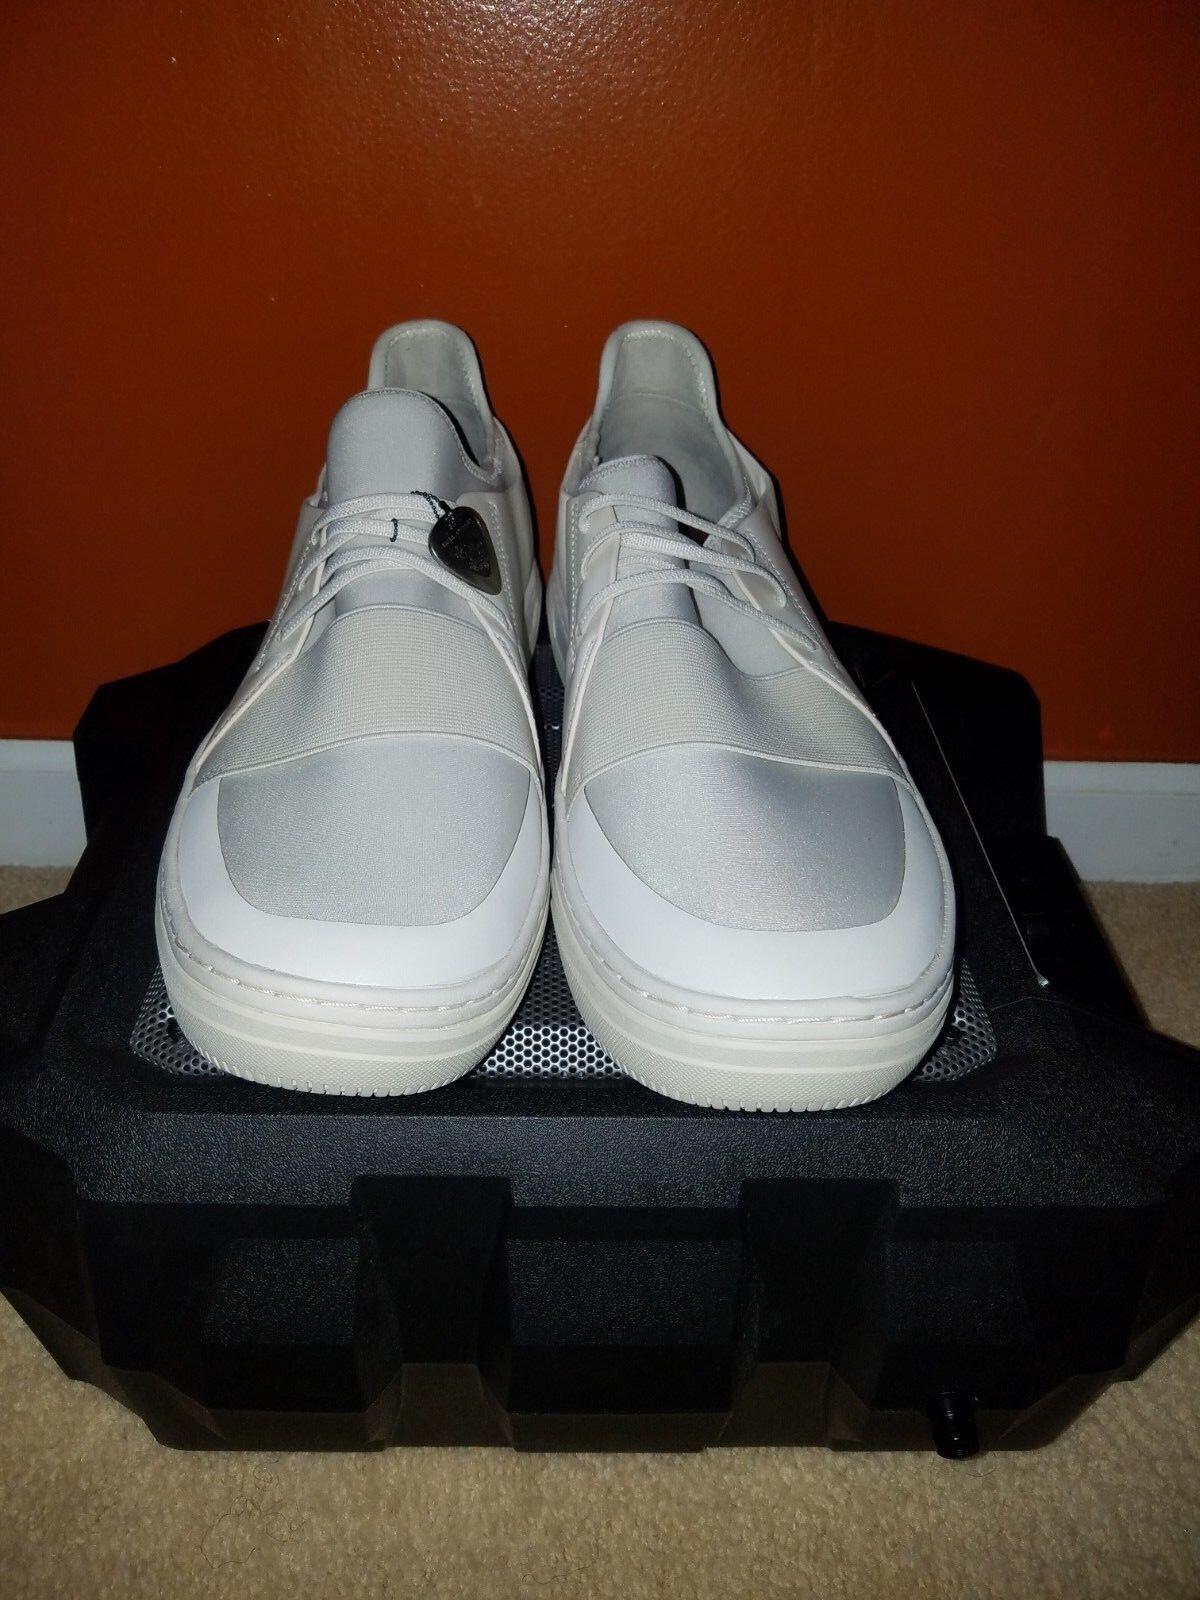 Casual Mark Nason  shoes